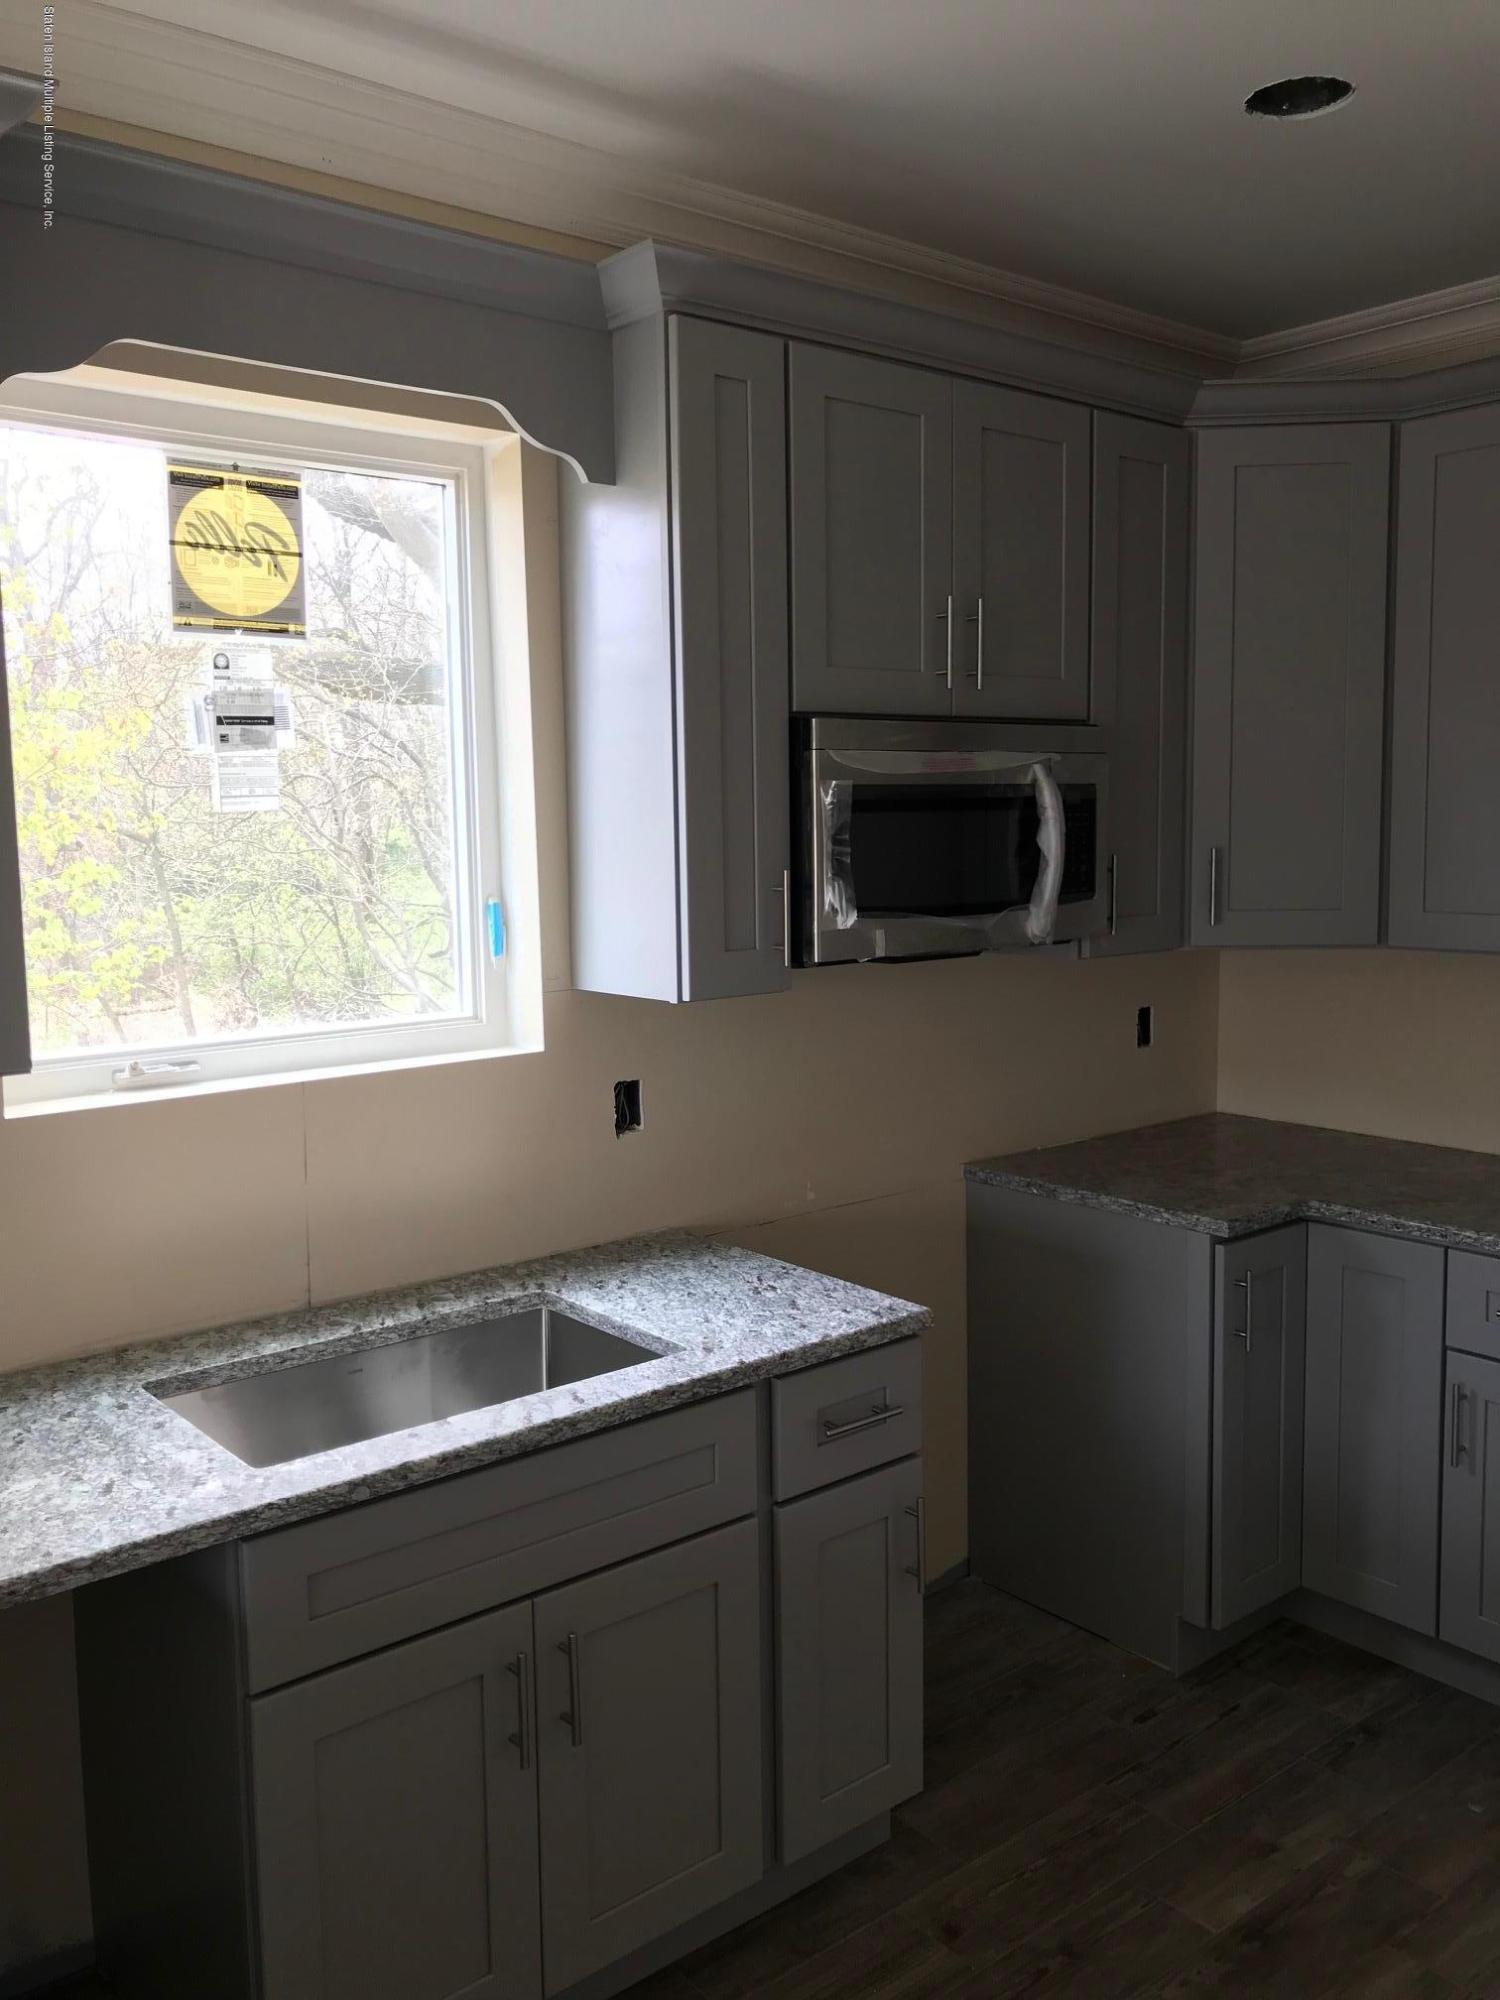 Single Family - Semi-Attached 324 Poultney Street  Staten Island, NY 10306, MLS-1126573-10